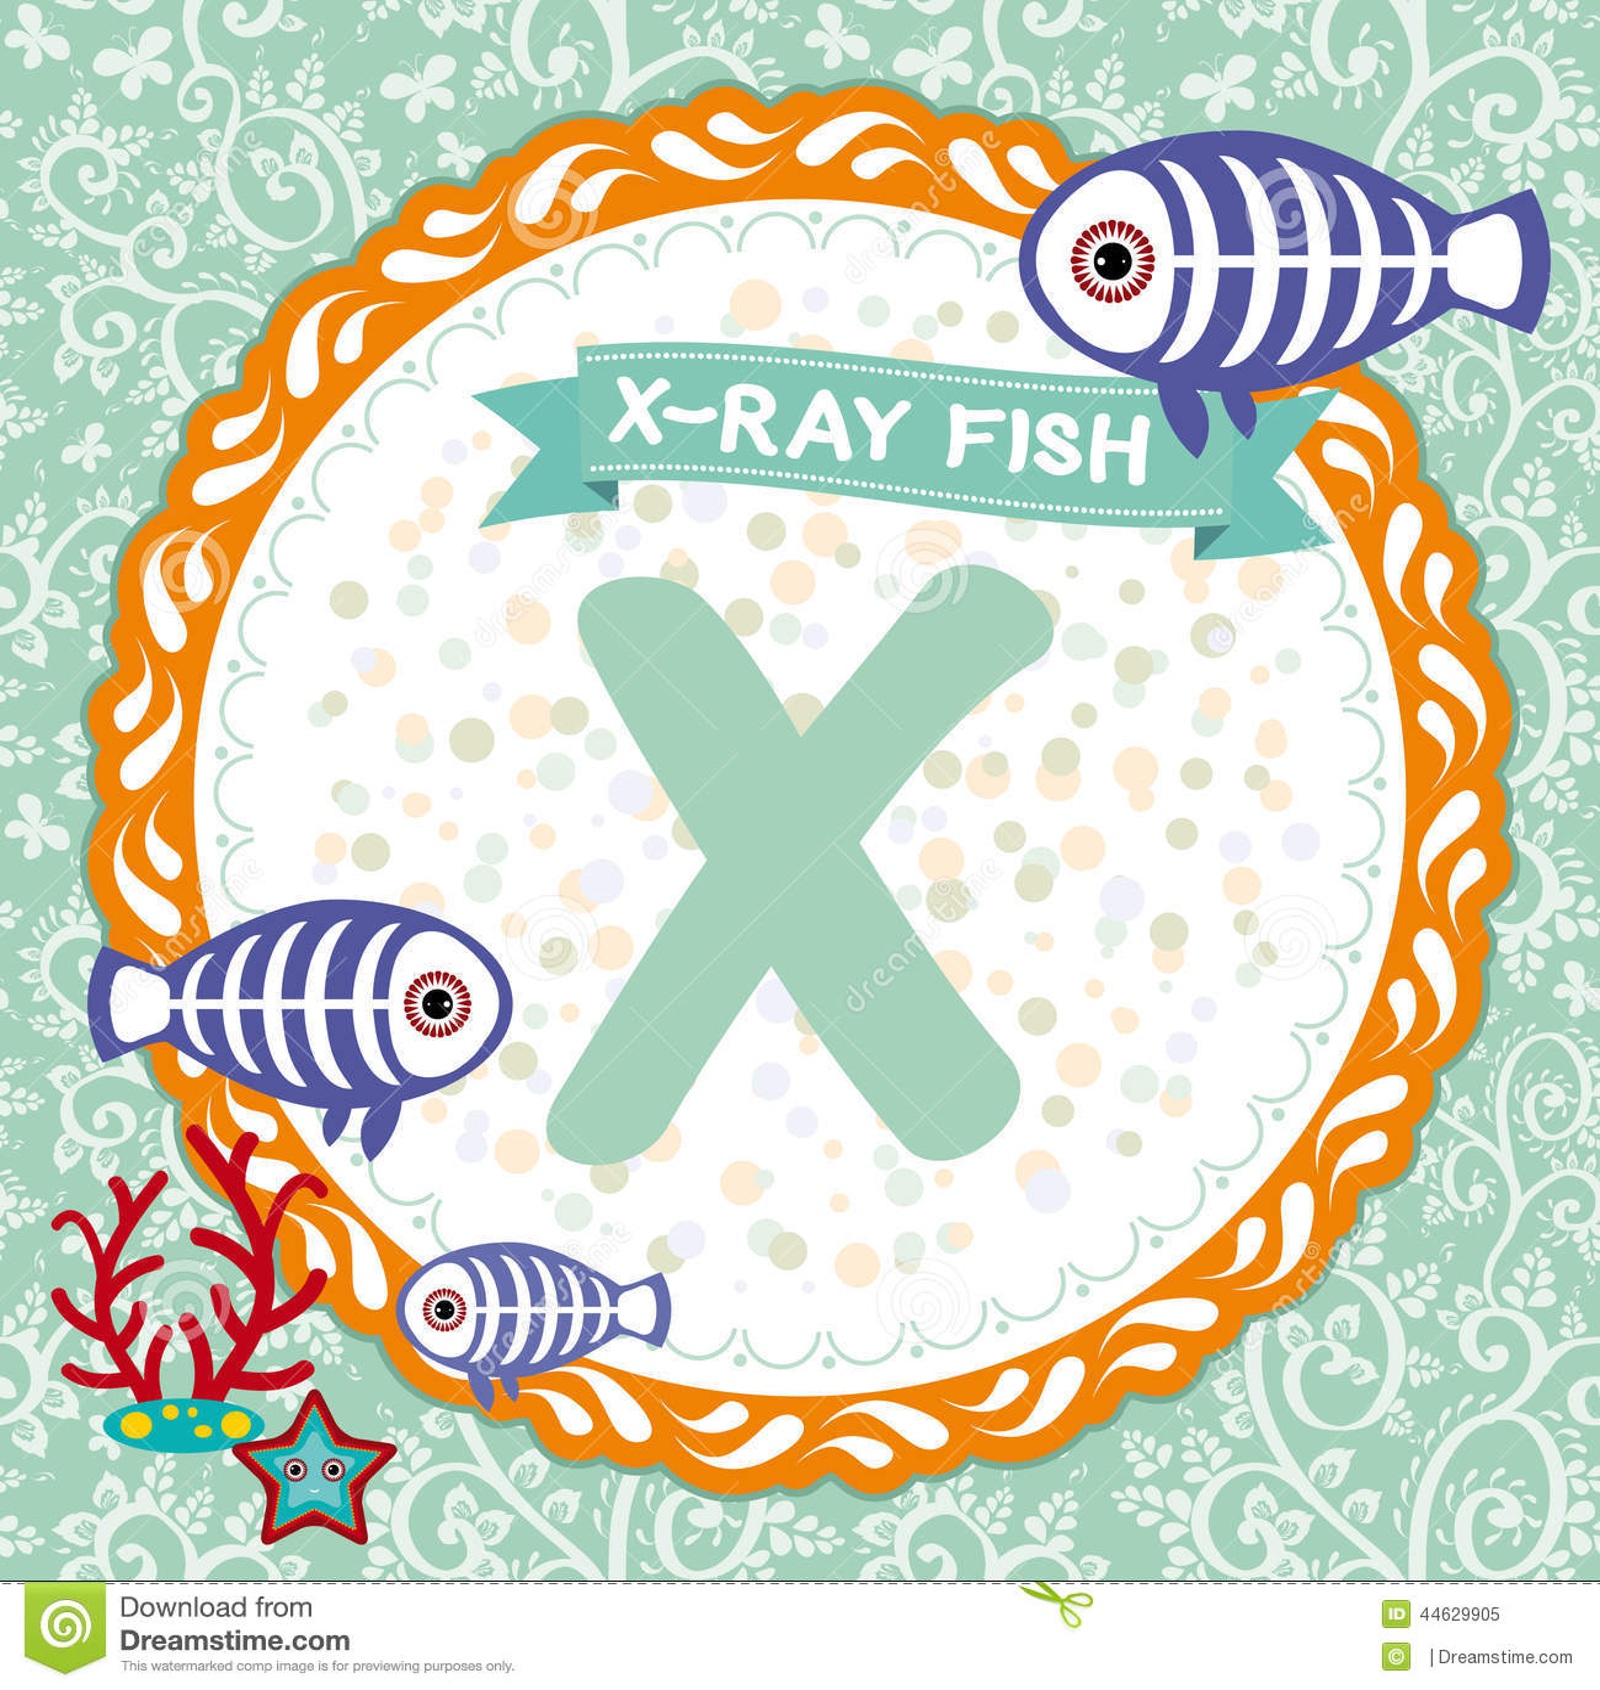 Abc Animals X Is X Ray Fish Childrens English Alphabet